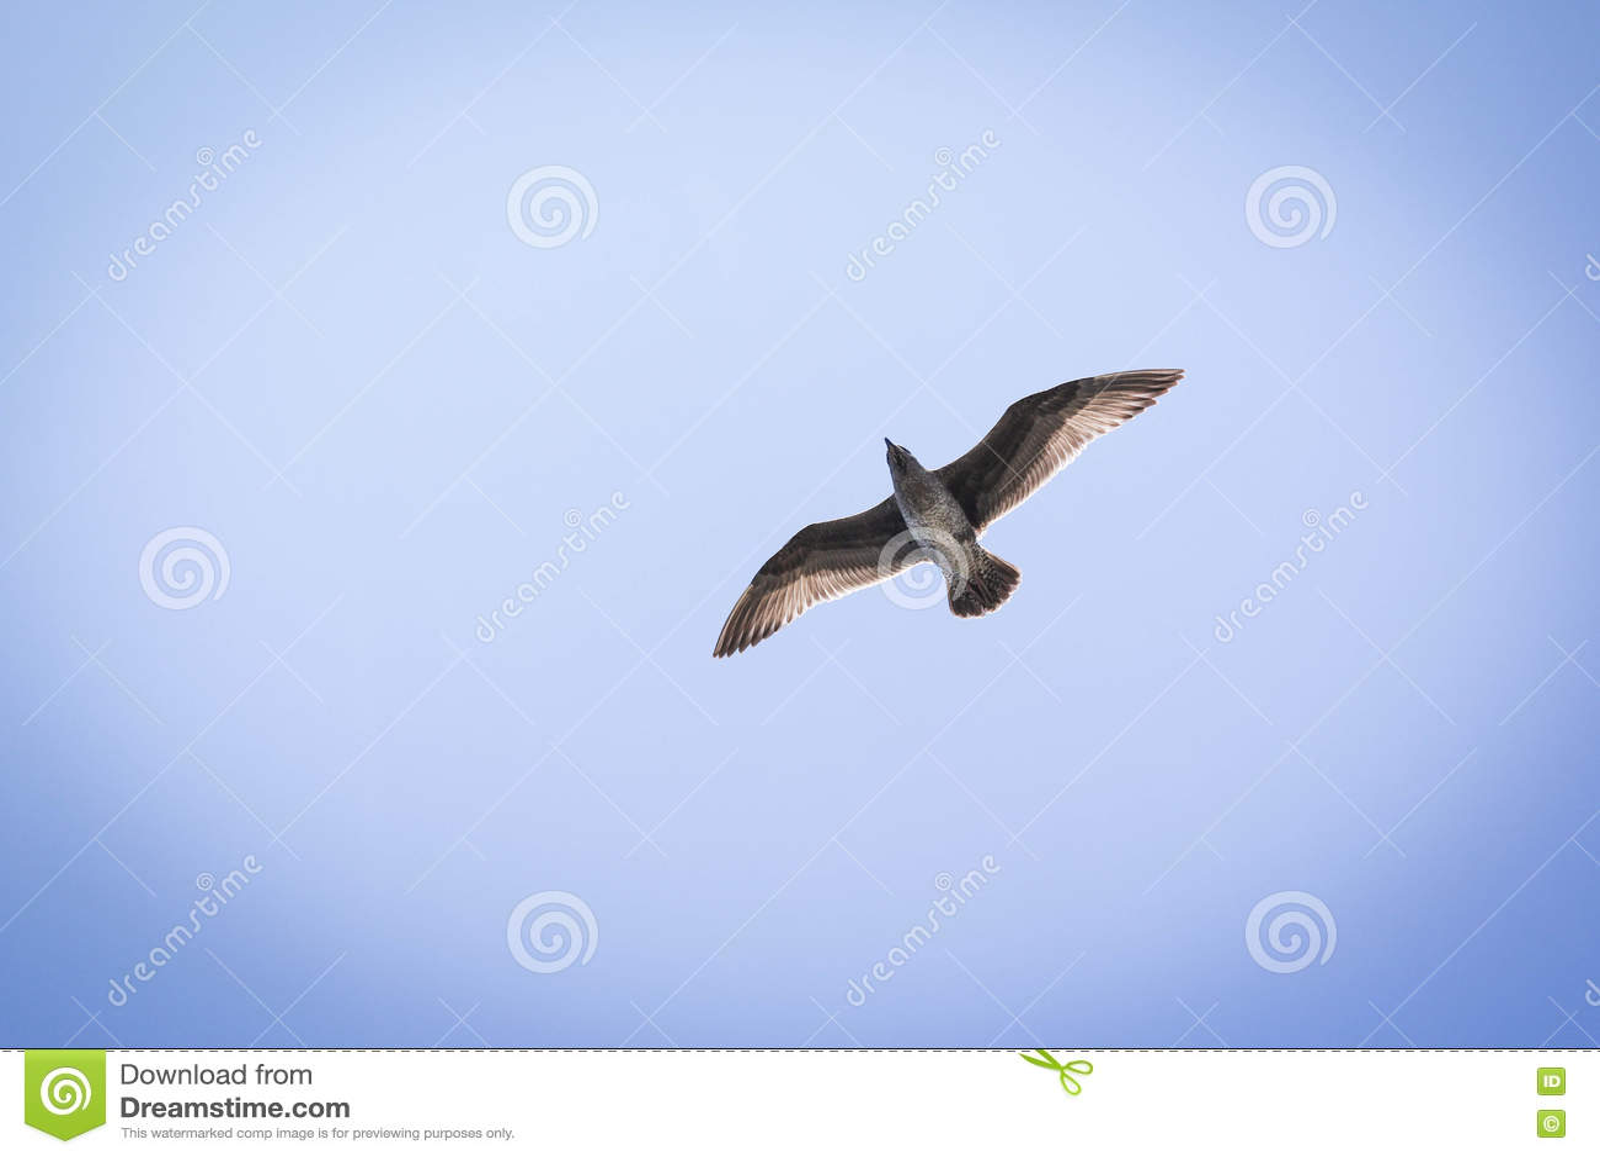 Seagull κατά την πτήση ενάντια σε έναν μπλε ουρανό με το φως του ήλιου μέσω των φτερών